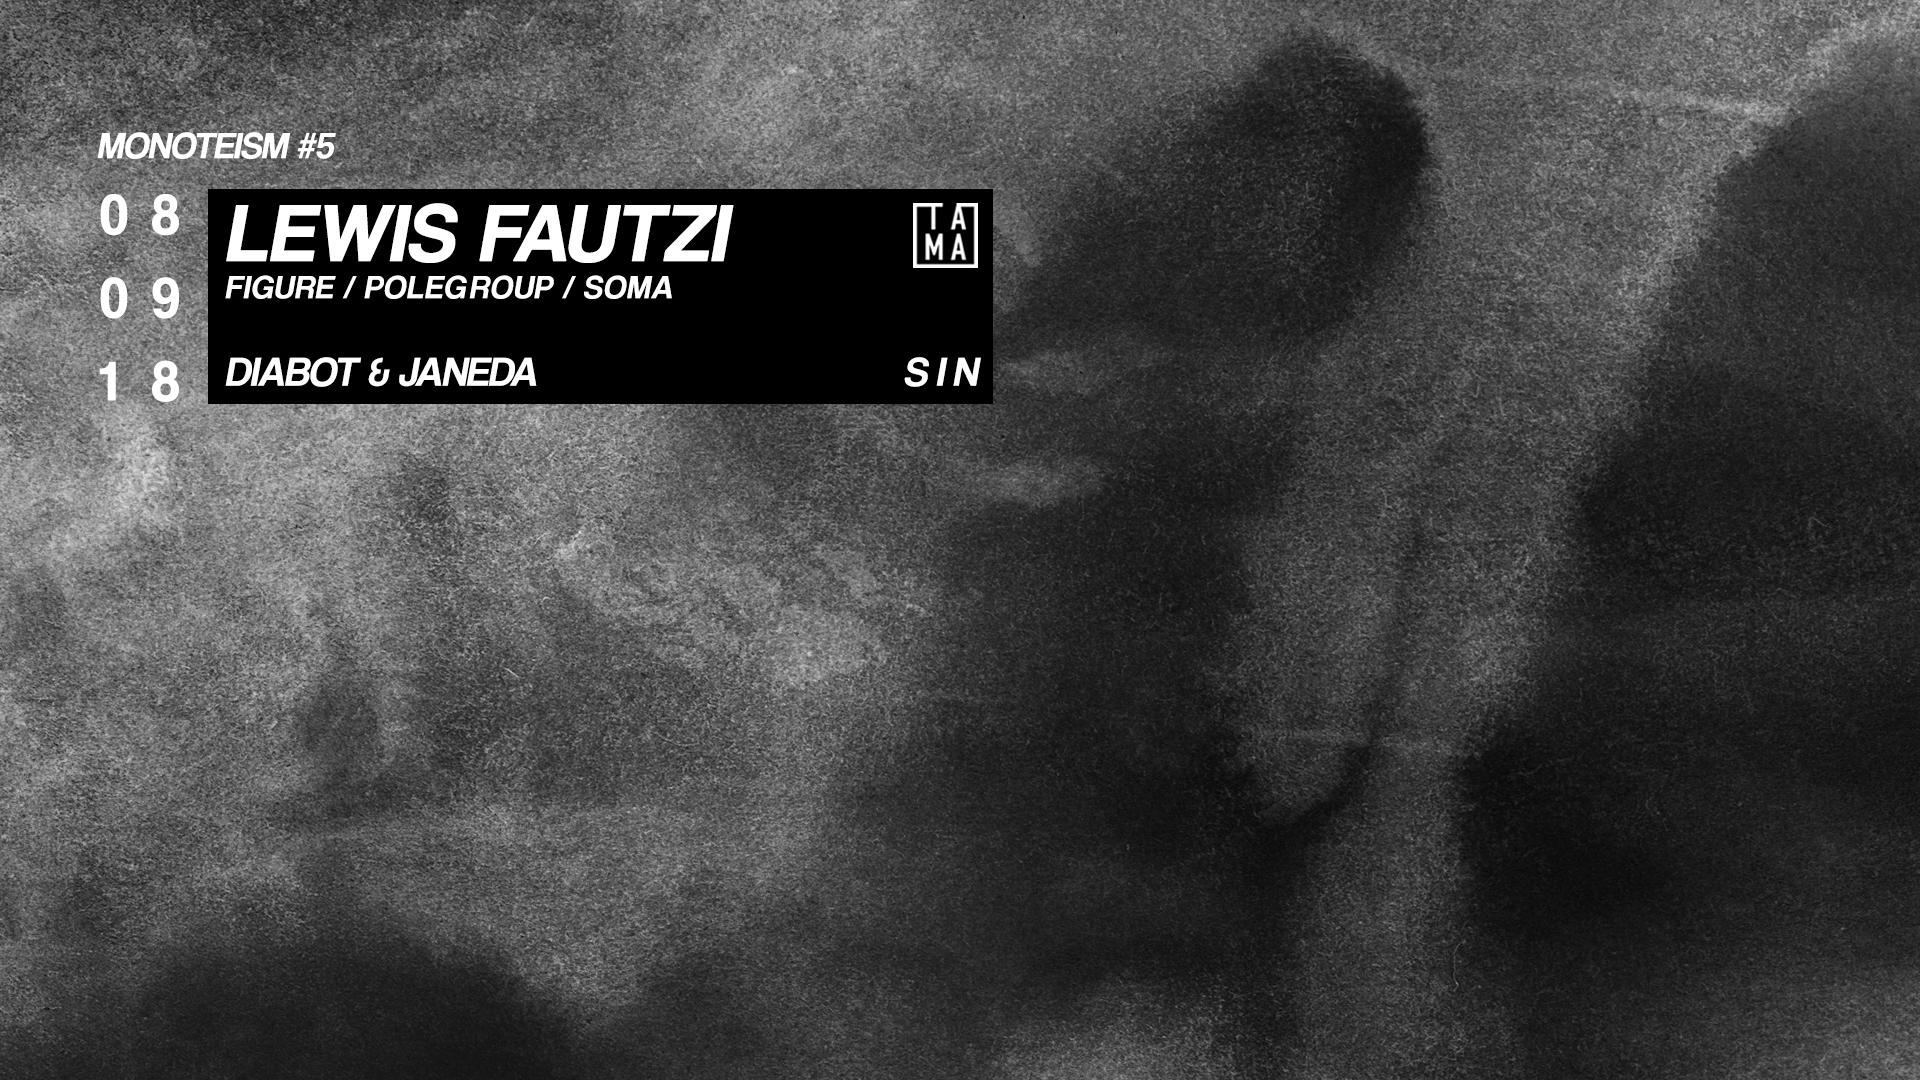 Monoteism #5: Lewis Fautzi / Diabot & Janeda / Sin